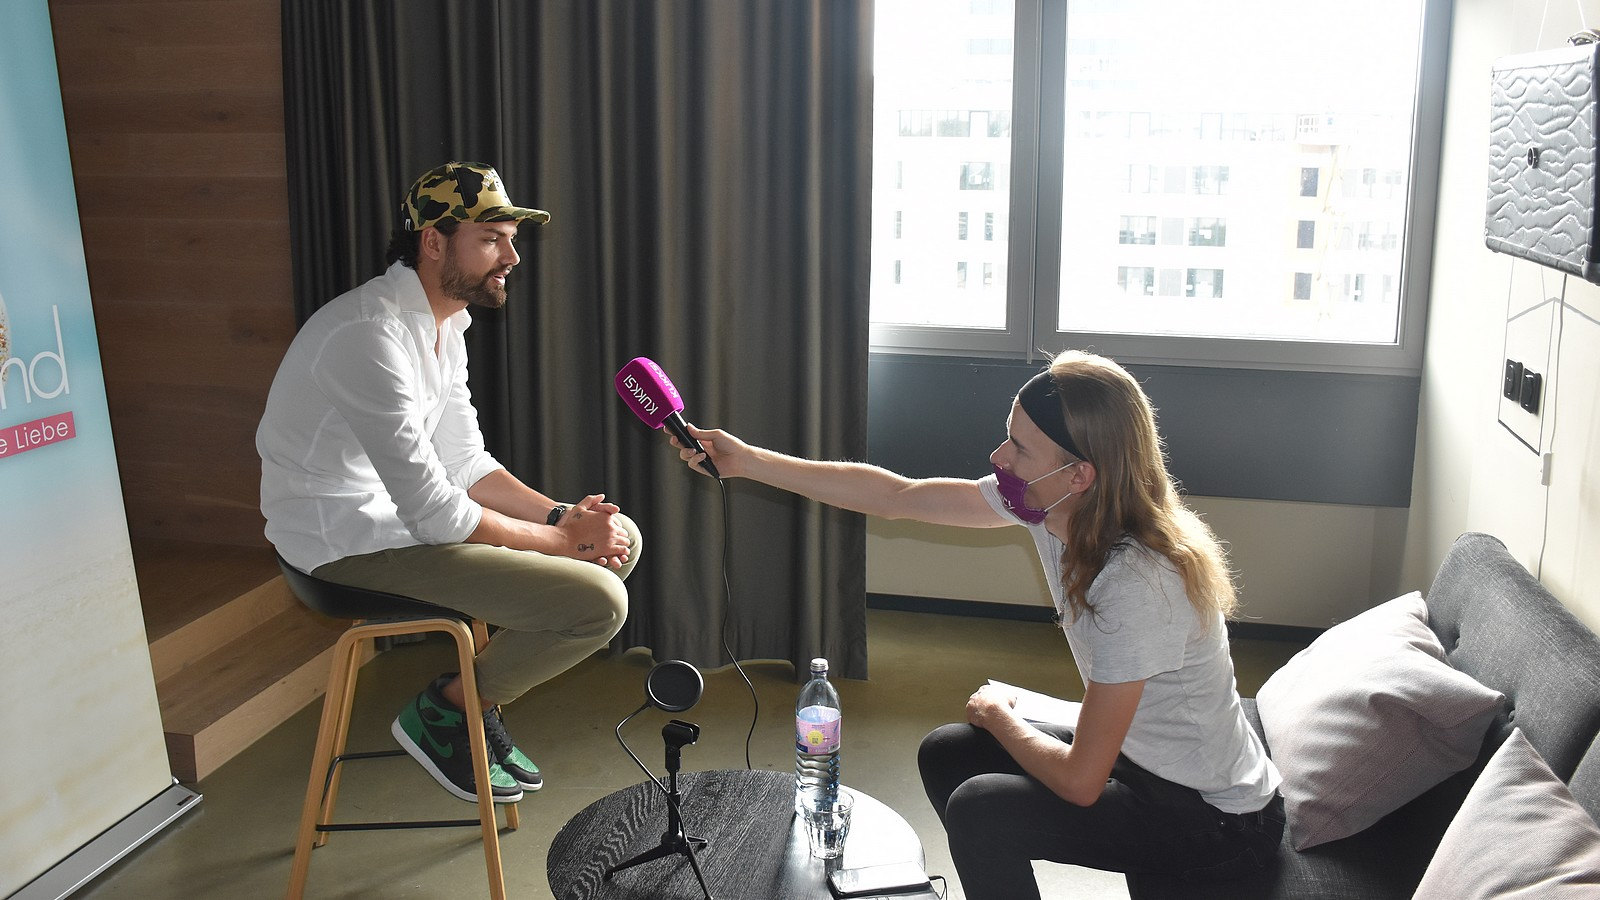 Jimi Blue Ochsenknecht im KUKKSI-Interview mit Reporter Oliver Stangl